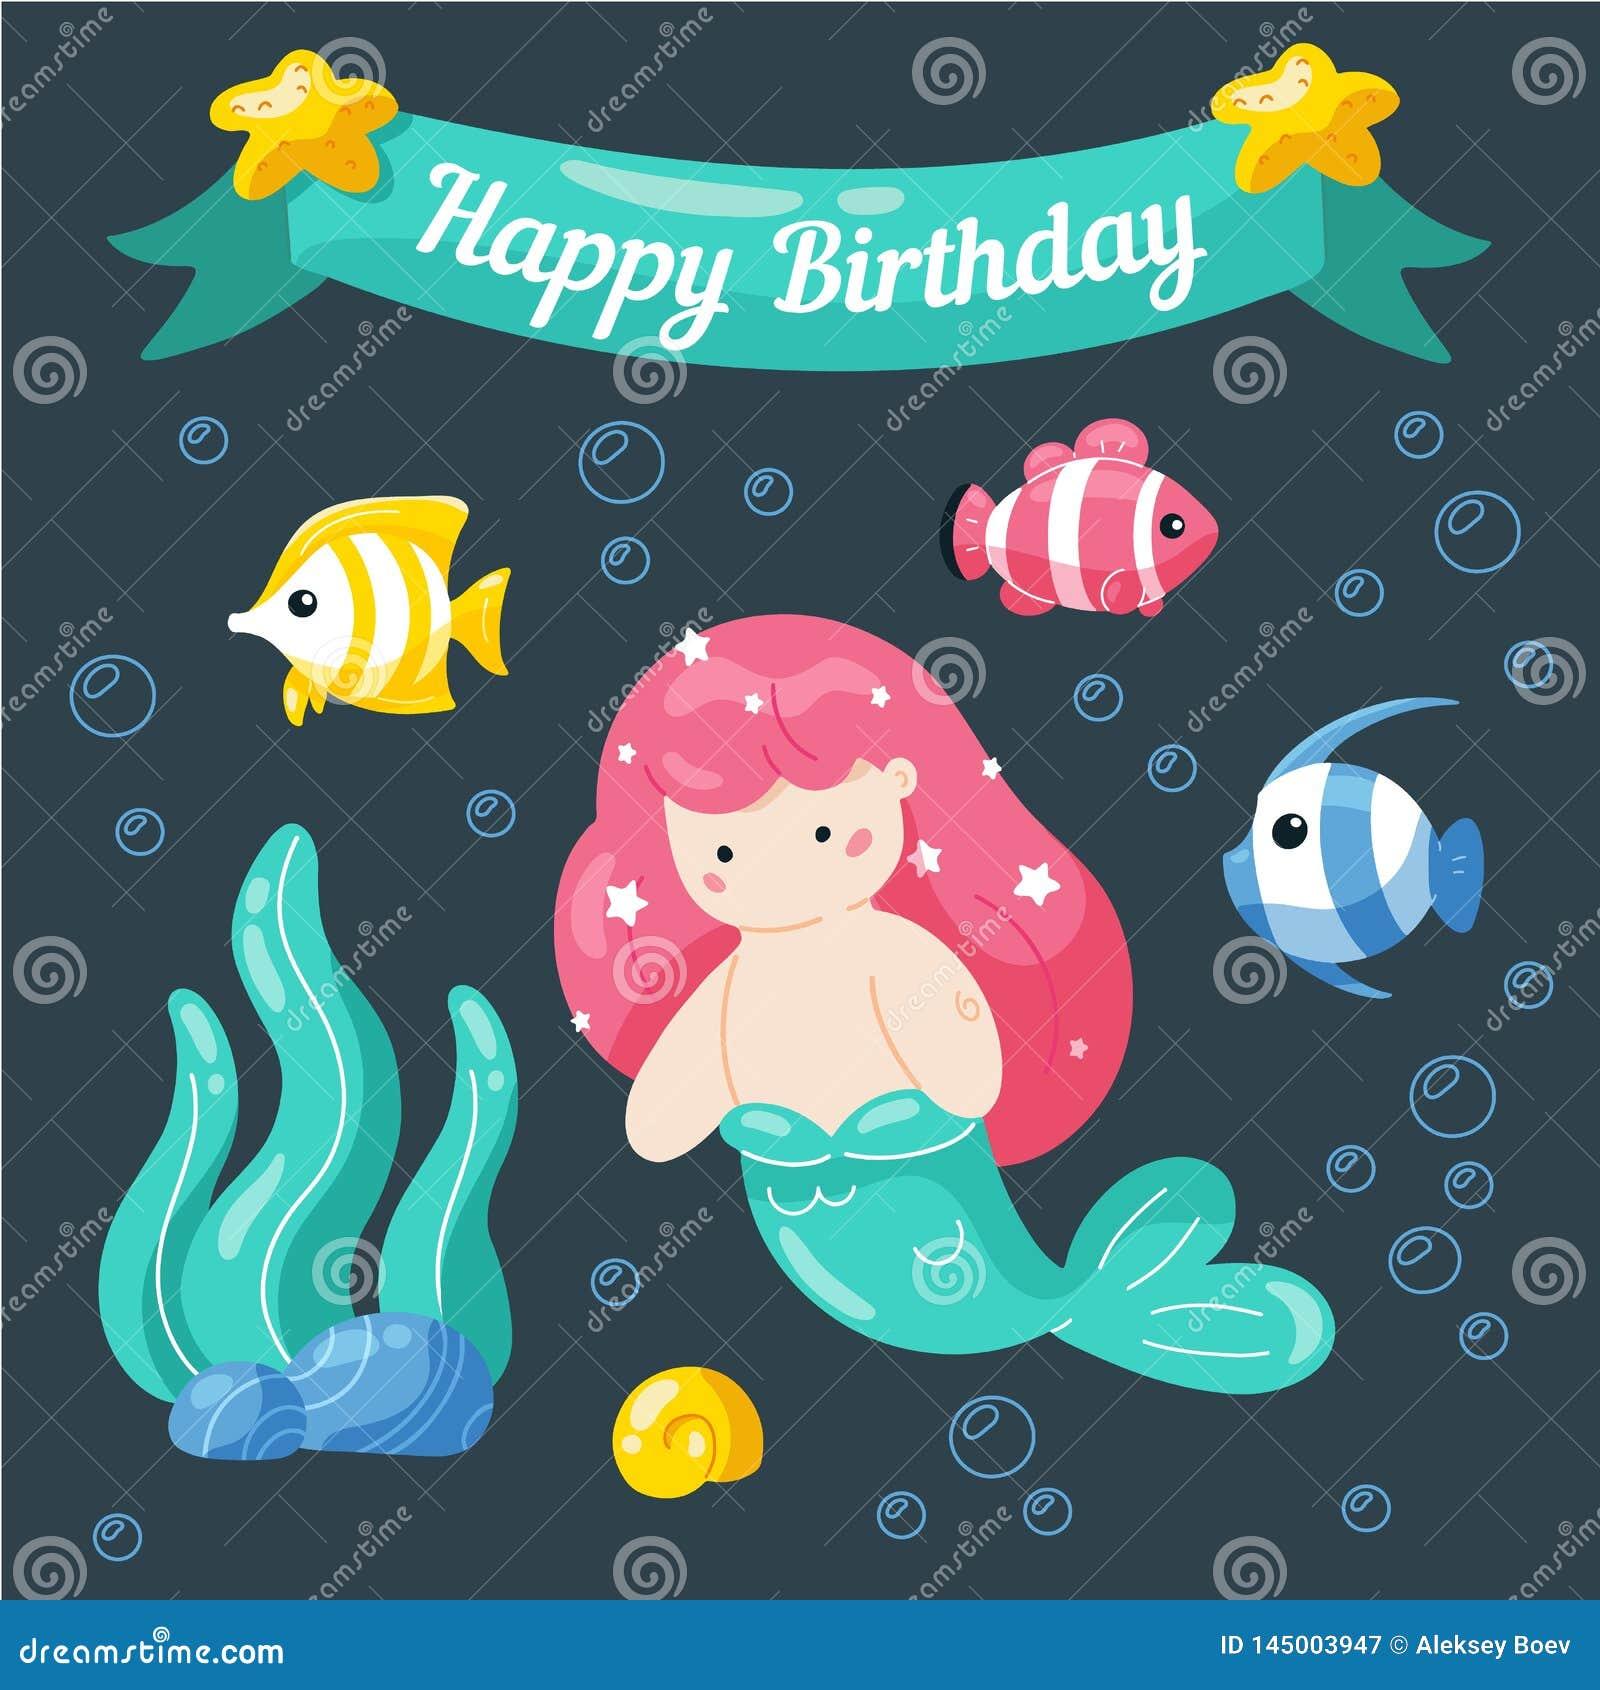 Cute little mermaid birthday card. Marine life cartoon characters in cute doodle style. Birthday card template